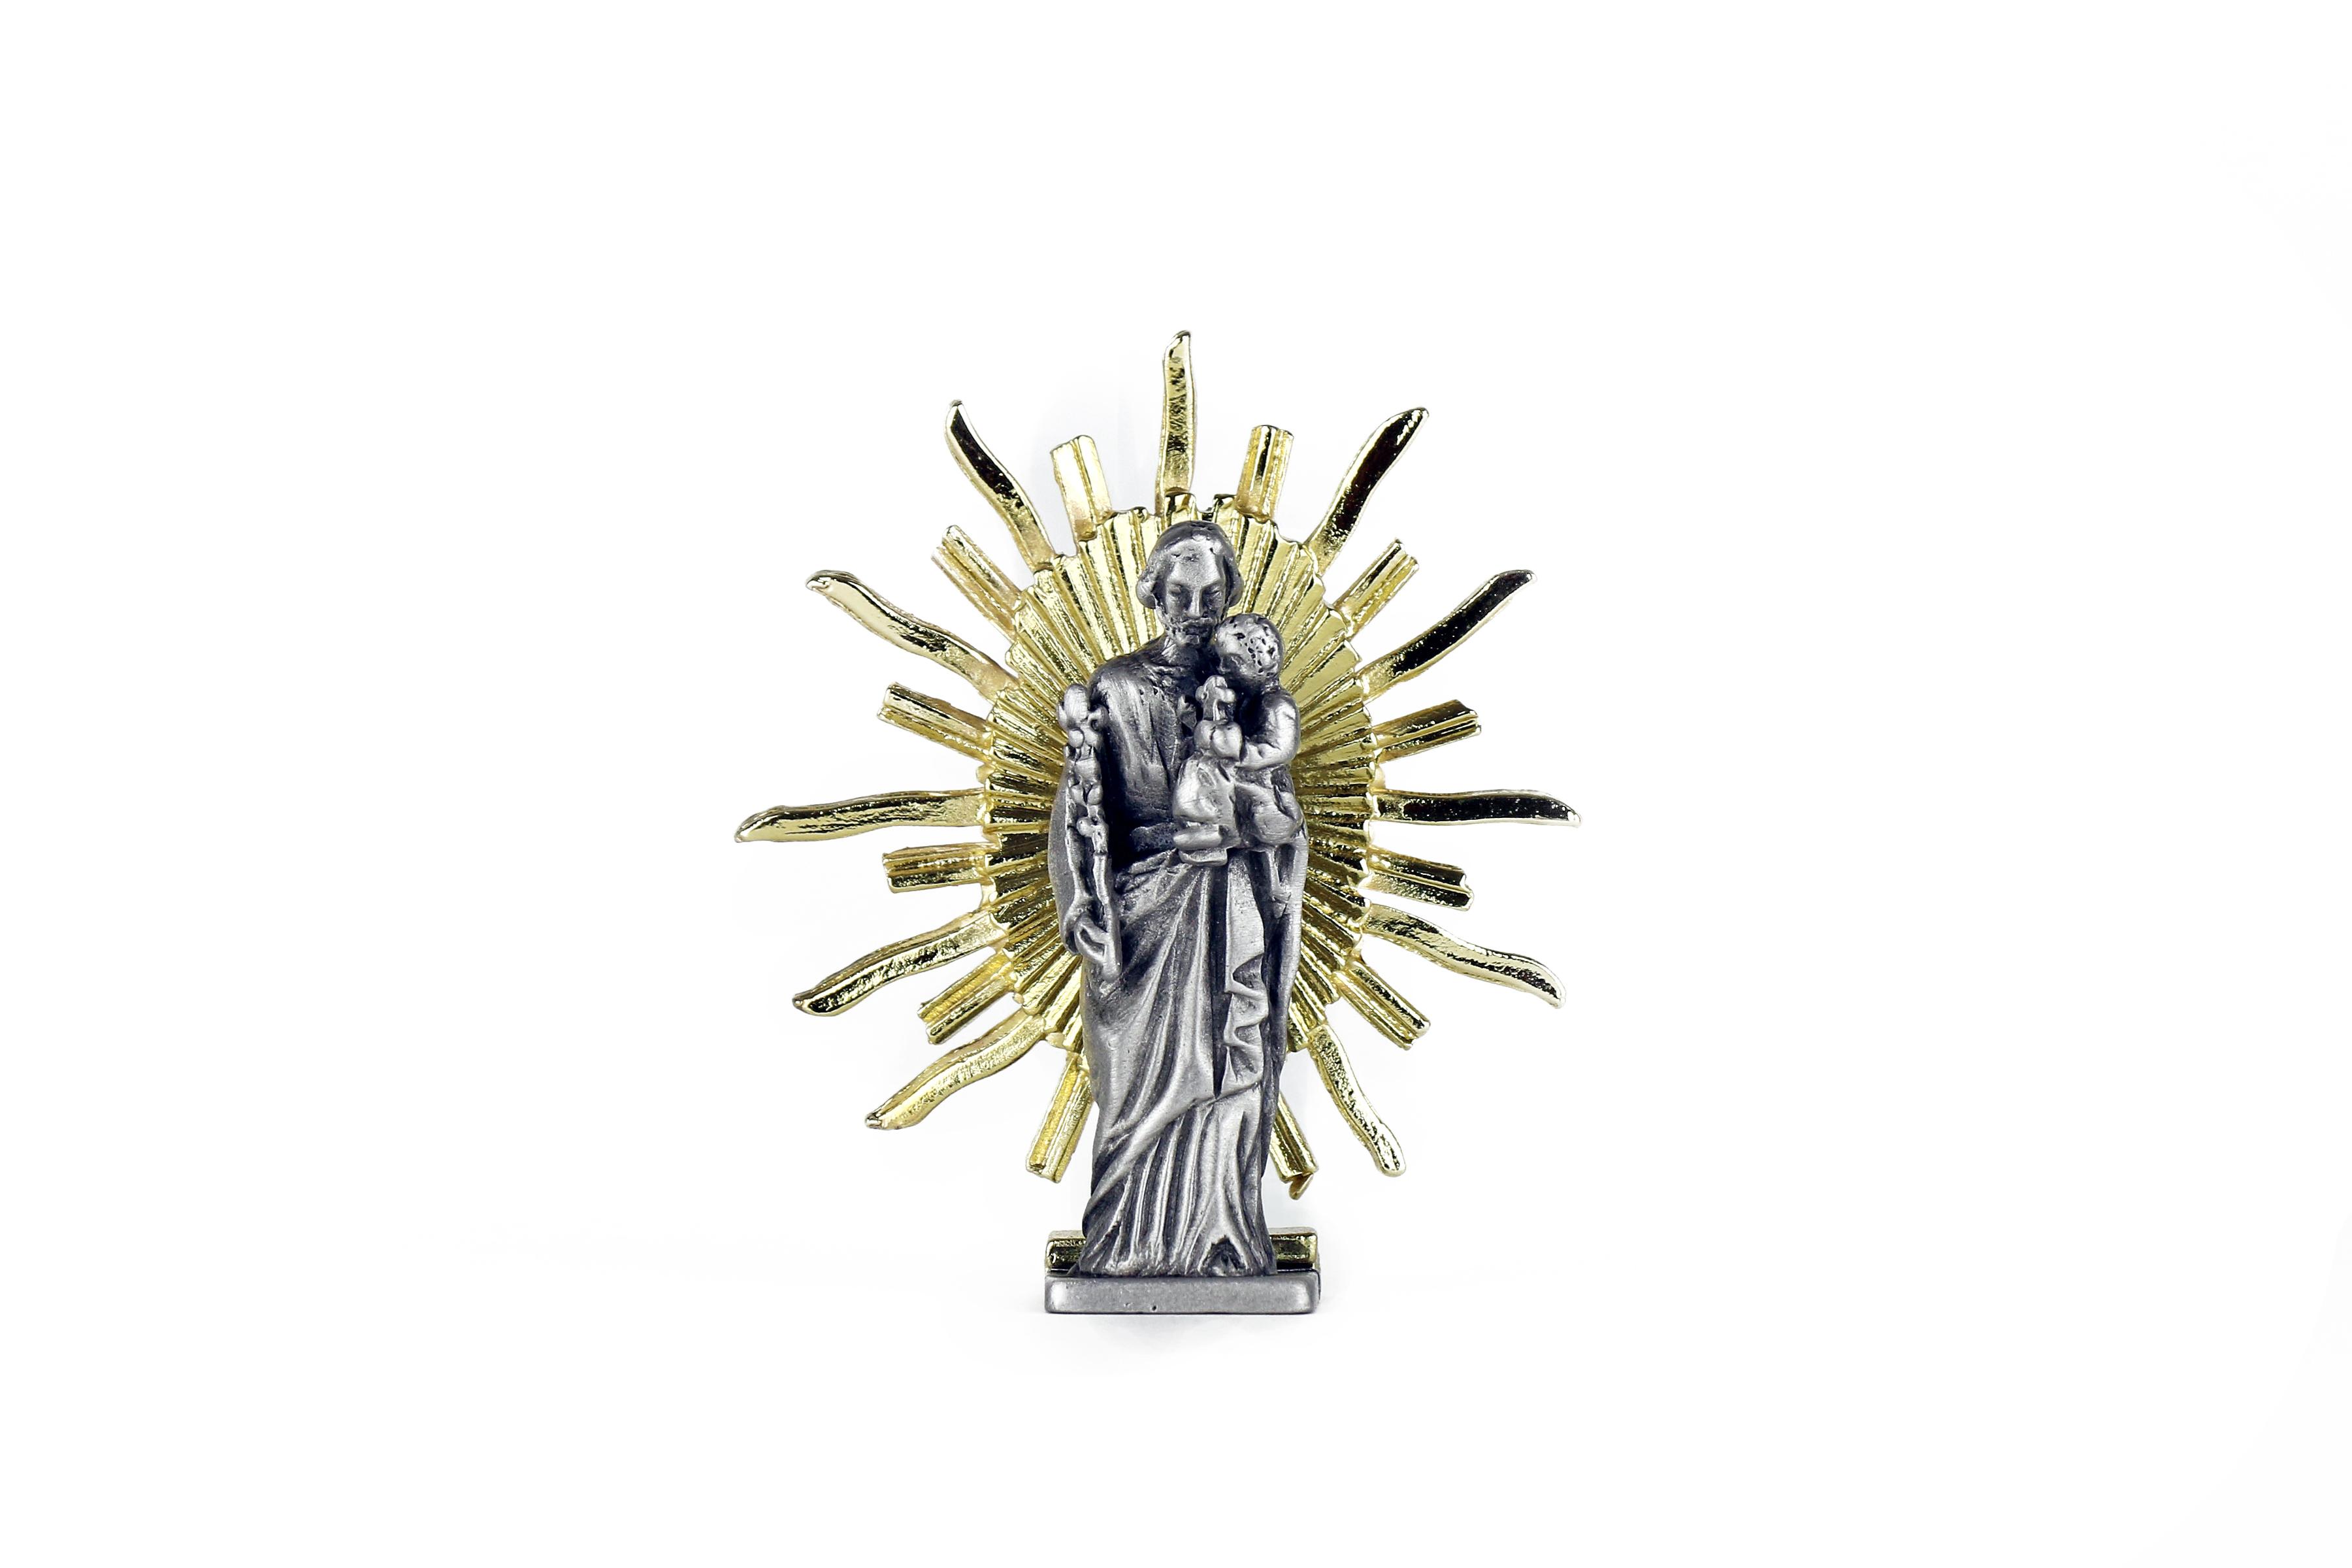 Saint Joseph avec rayons / Saint Joseph of the crypt